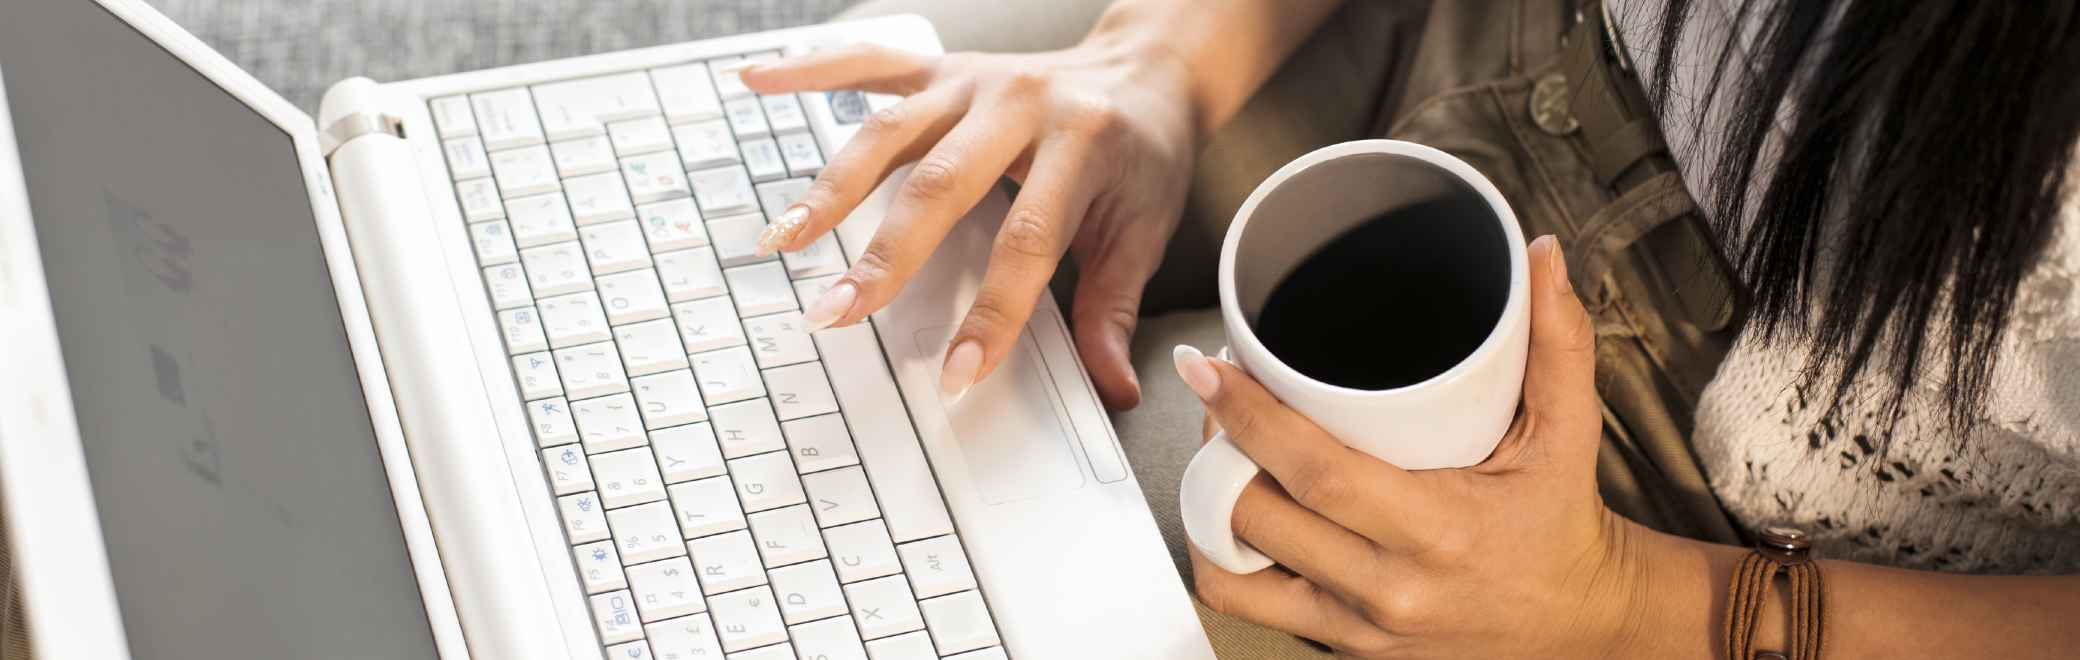 online learning through EducationUSA